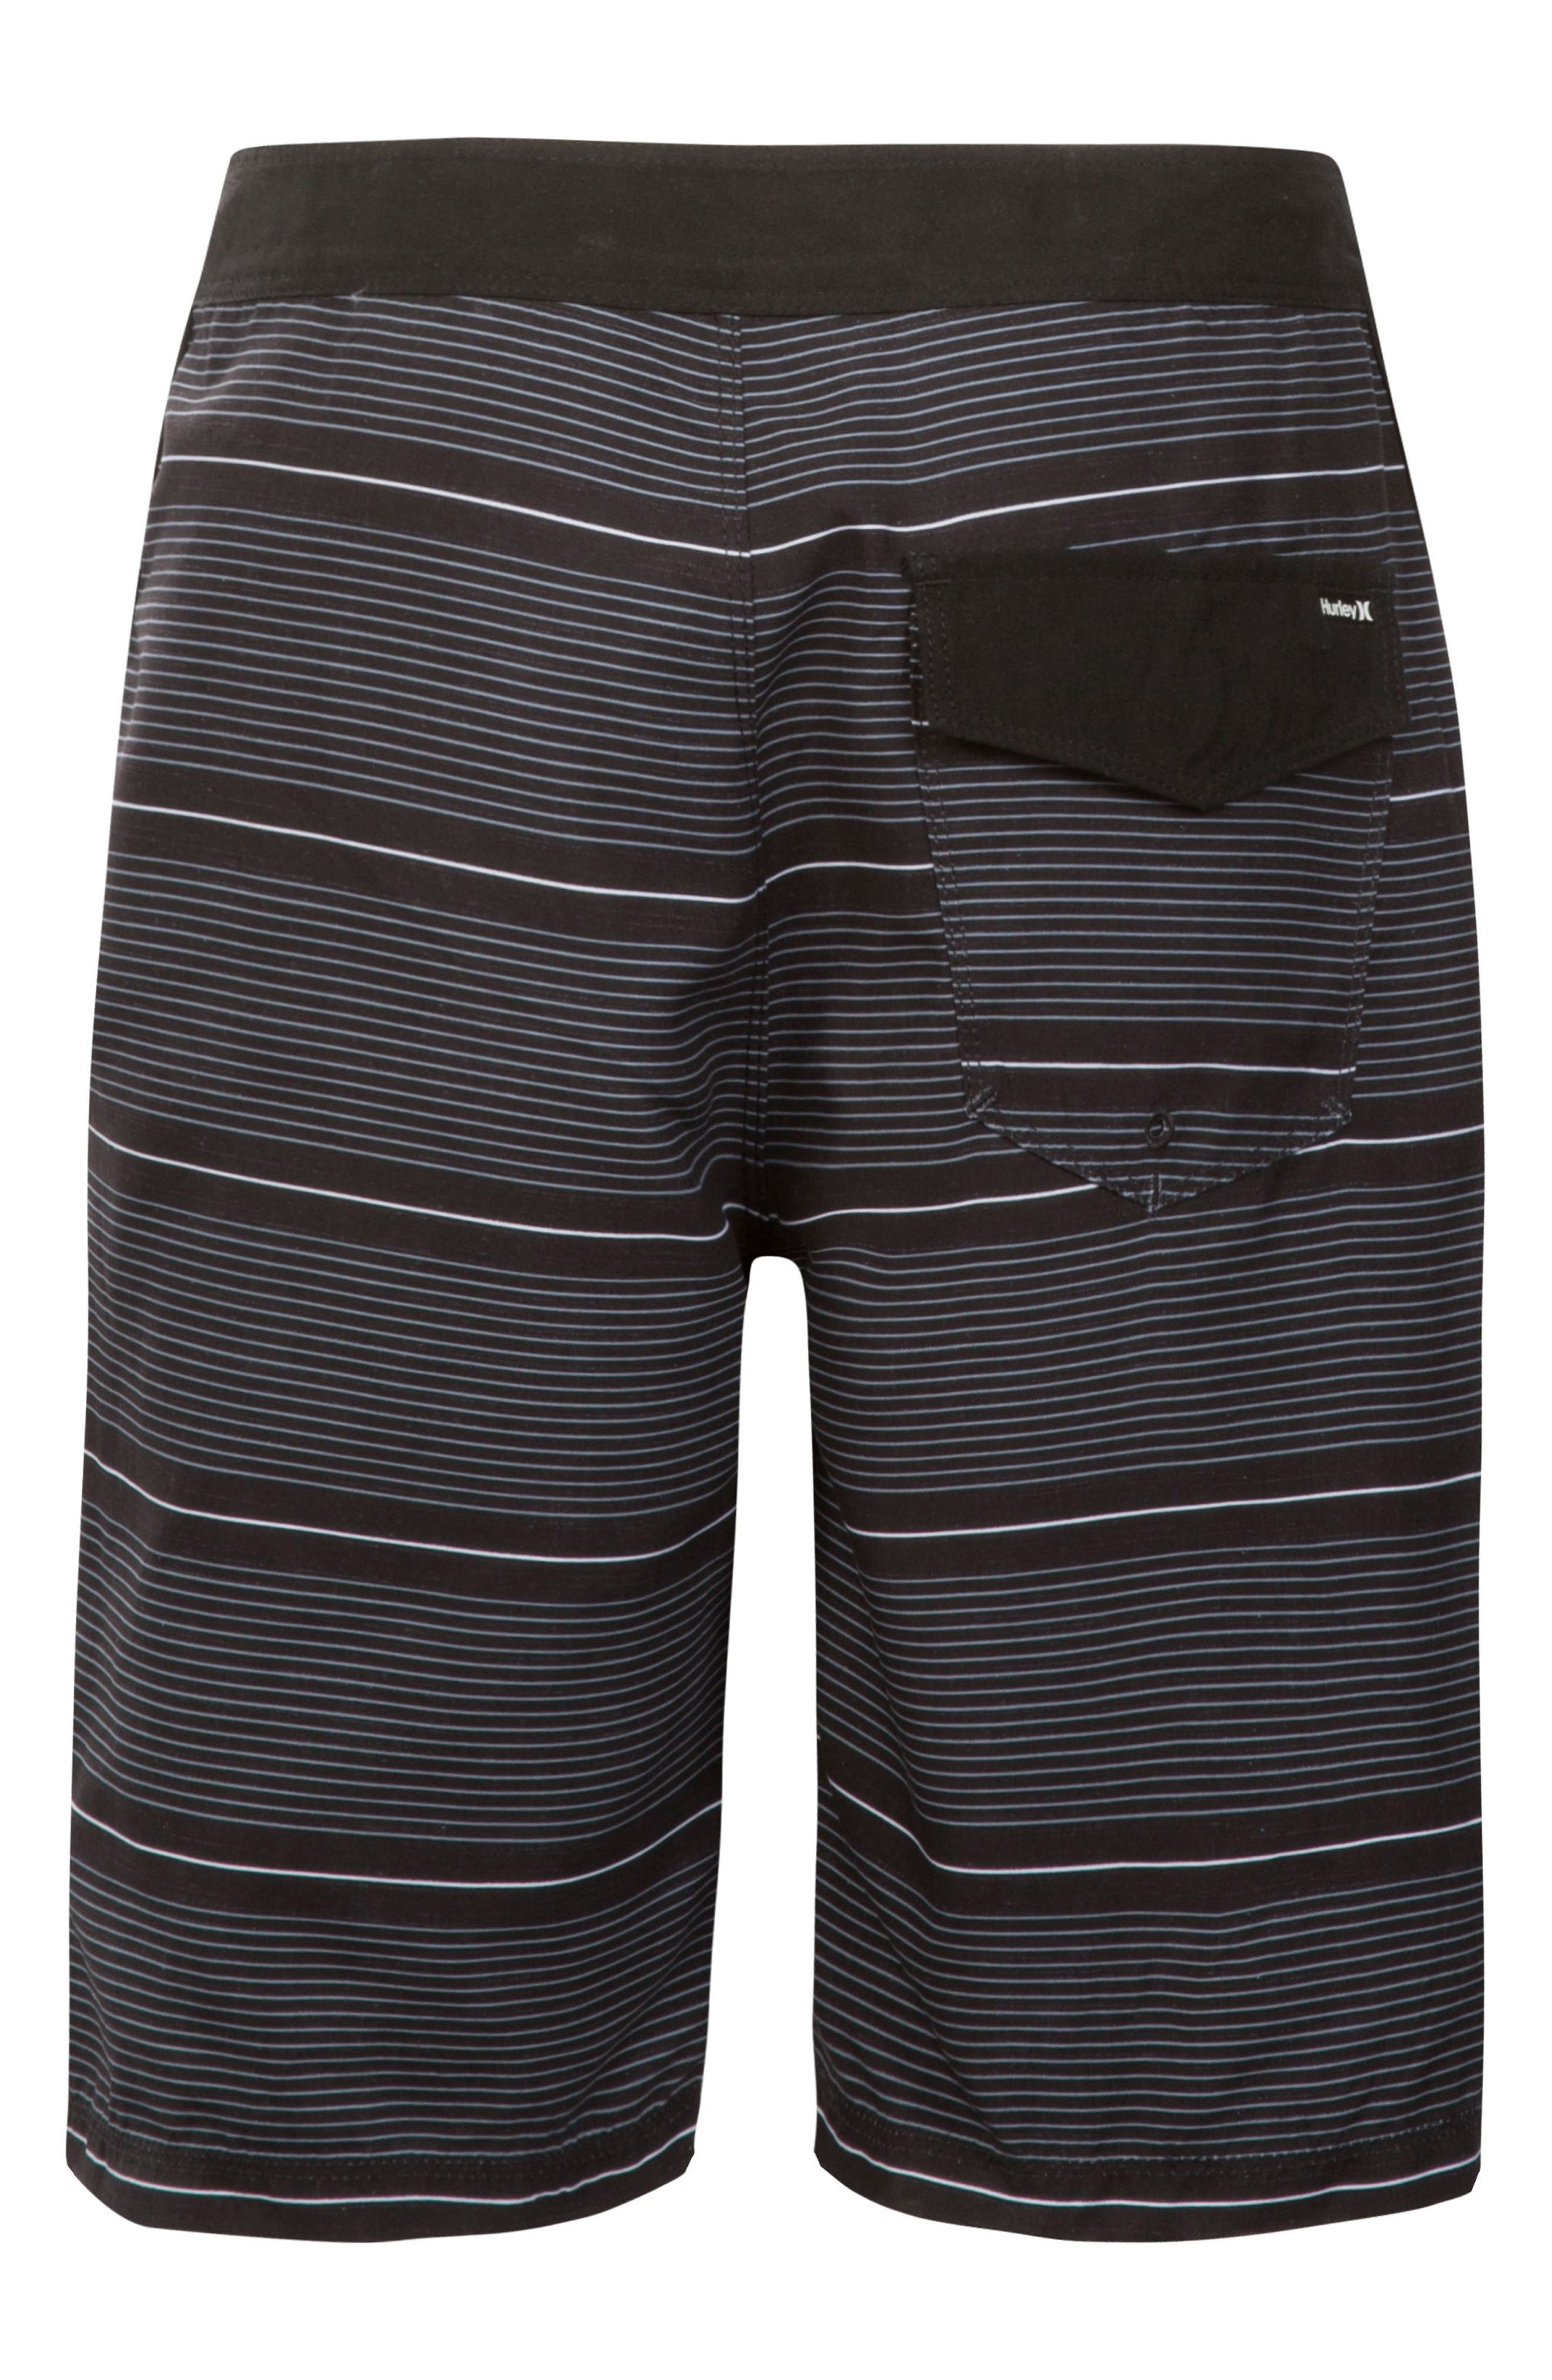 Shoreline Board Shorts,                             Alternate thumbnail 2, color,                             001